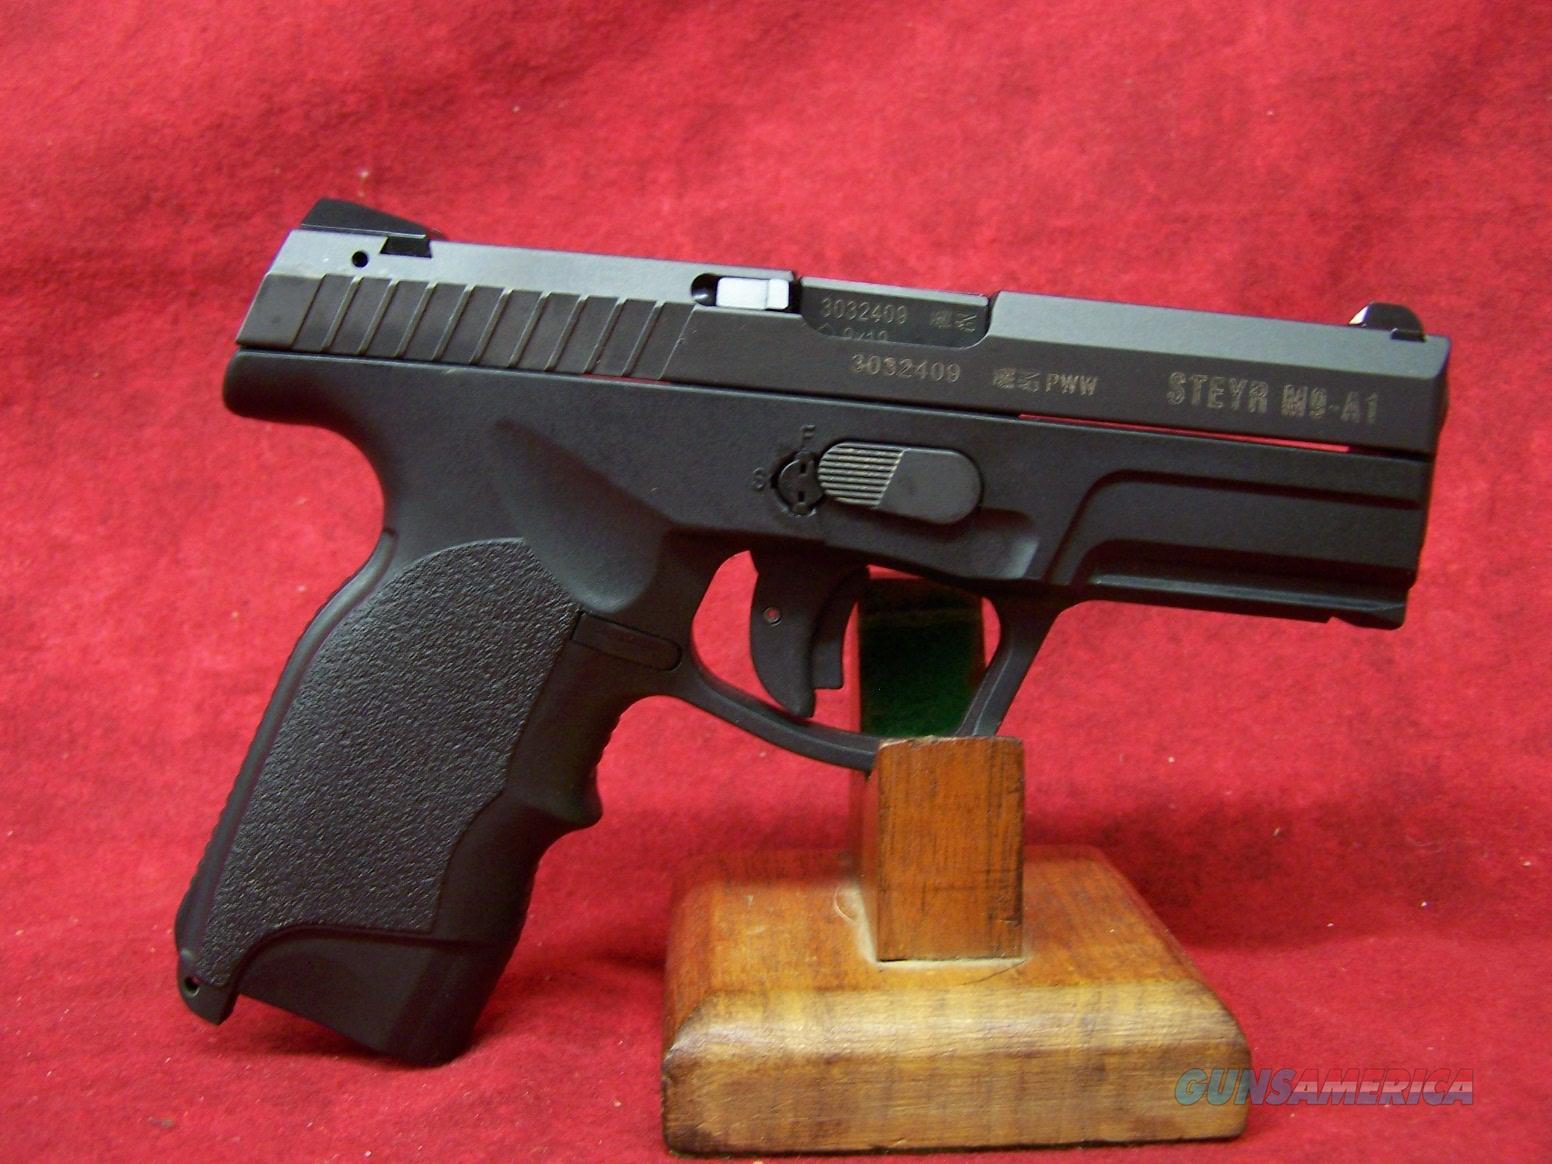 Steyr M9-A1 9mm Pistol 4